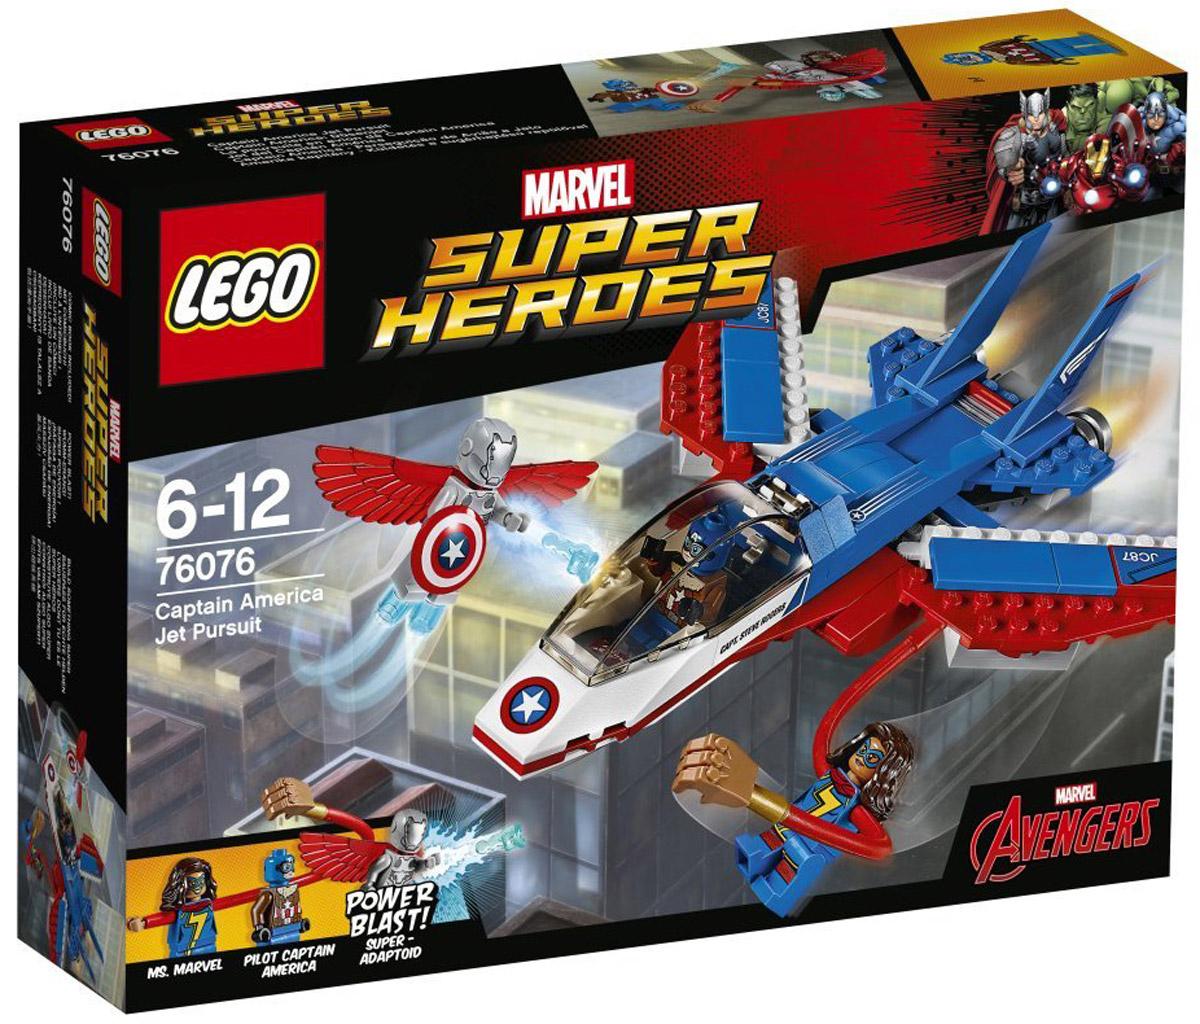 LEGO Super Heroes Конструктор Воздушная погоня Капитана Америка 76076 lego lego super heroes флэш против капитана холода